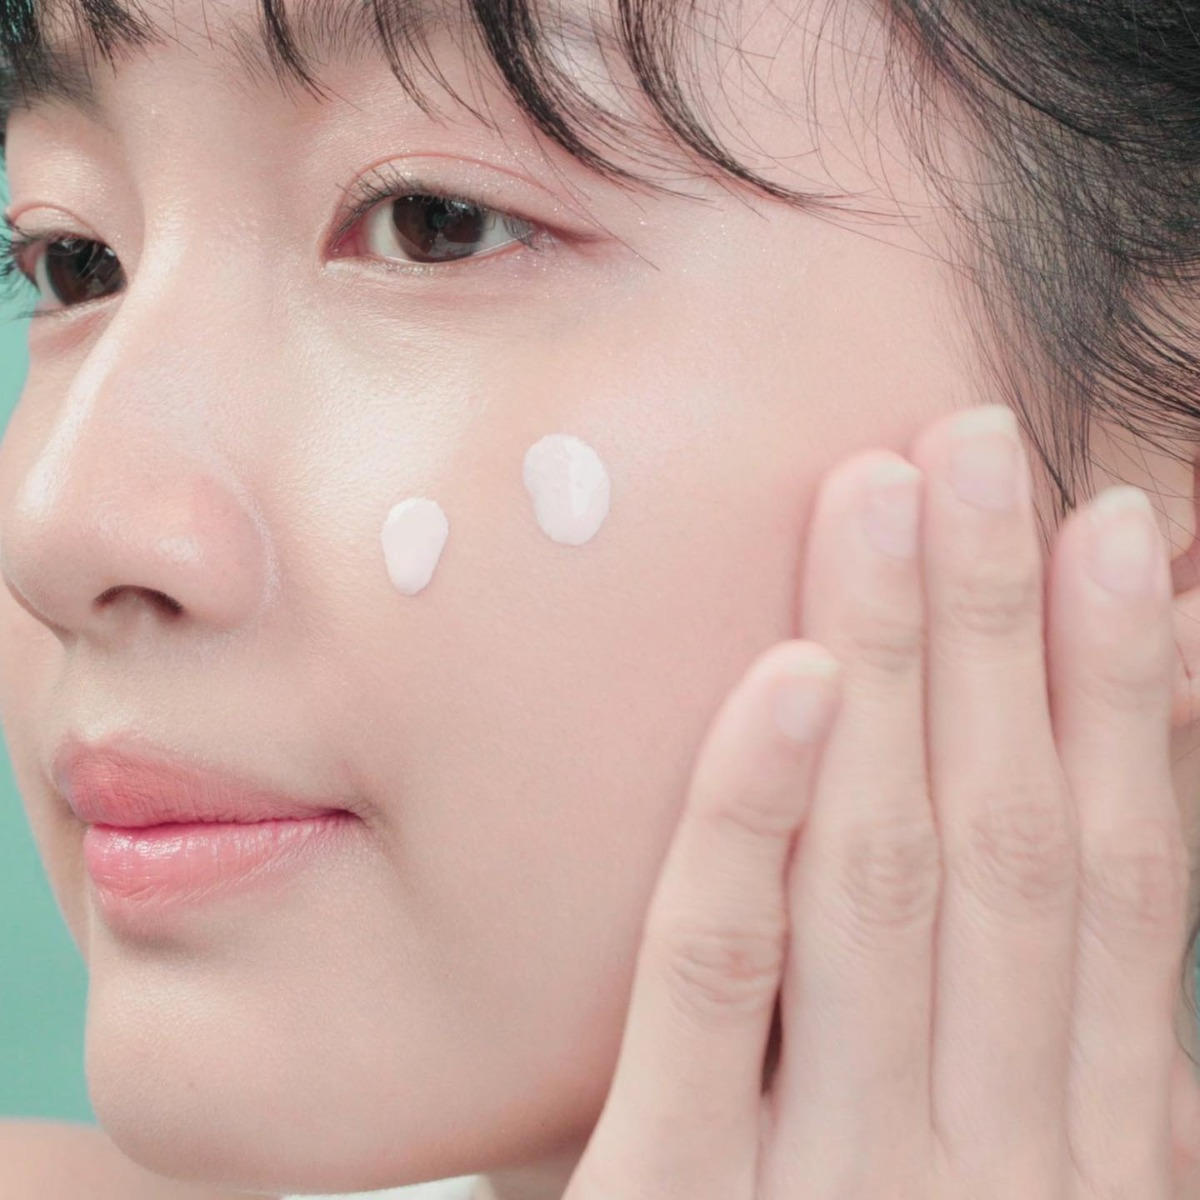 Kem Chống Nắng Ngừa Mụn Caryophy Smart Suncreen 3in1 SPF 50+ PA+++ 50ml